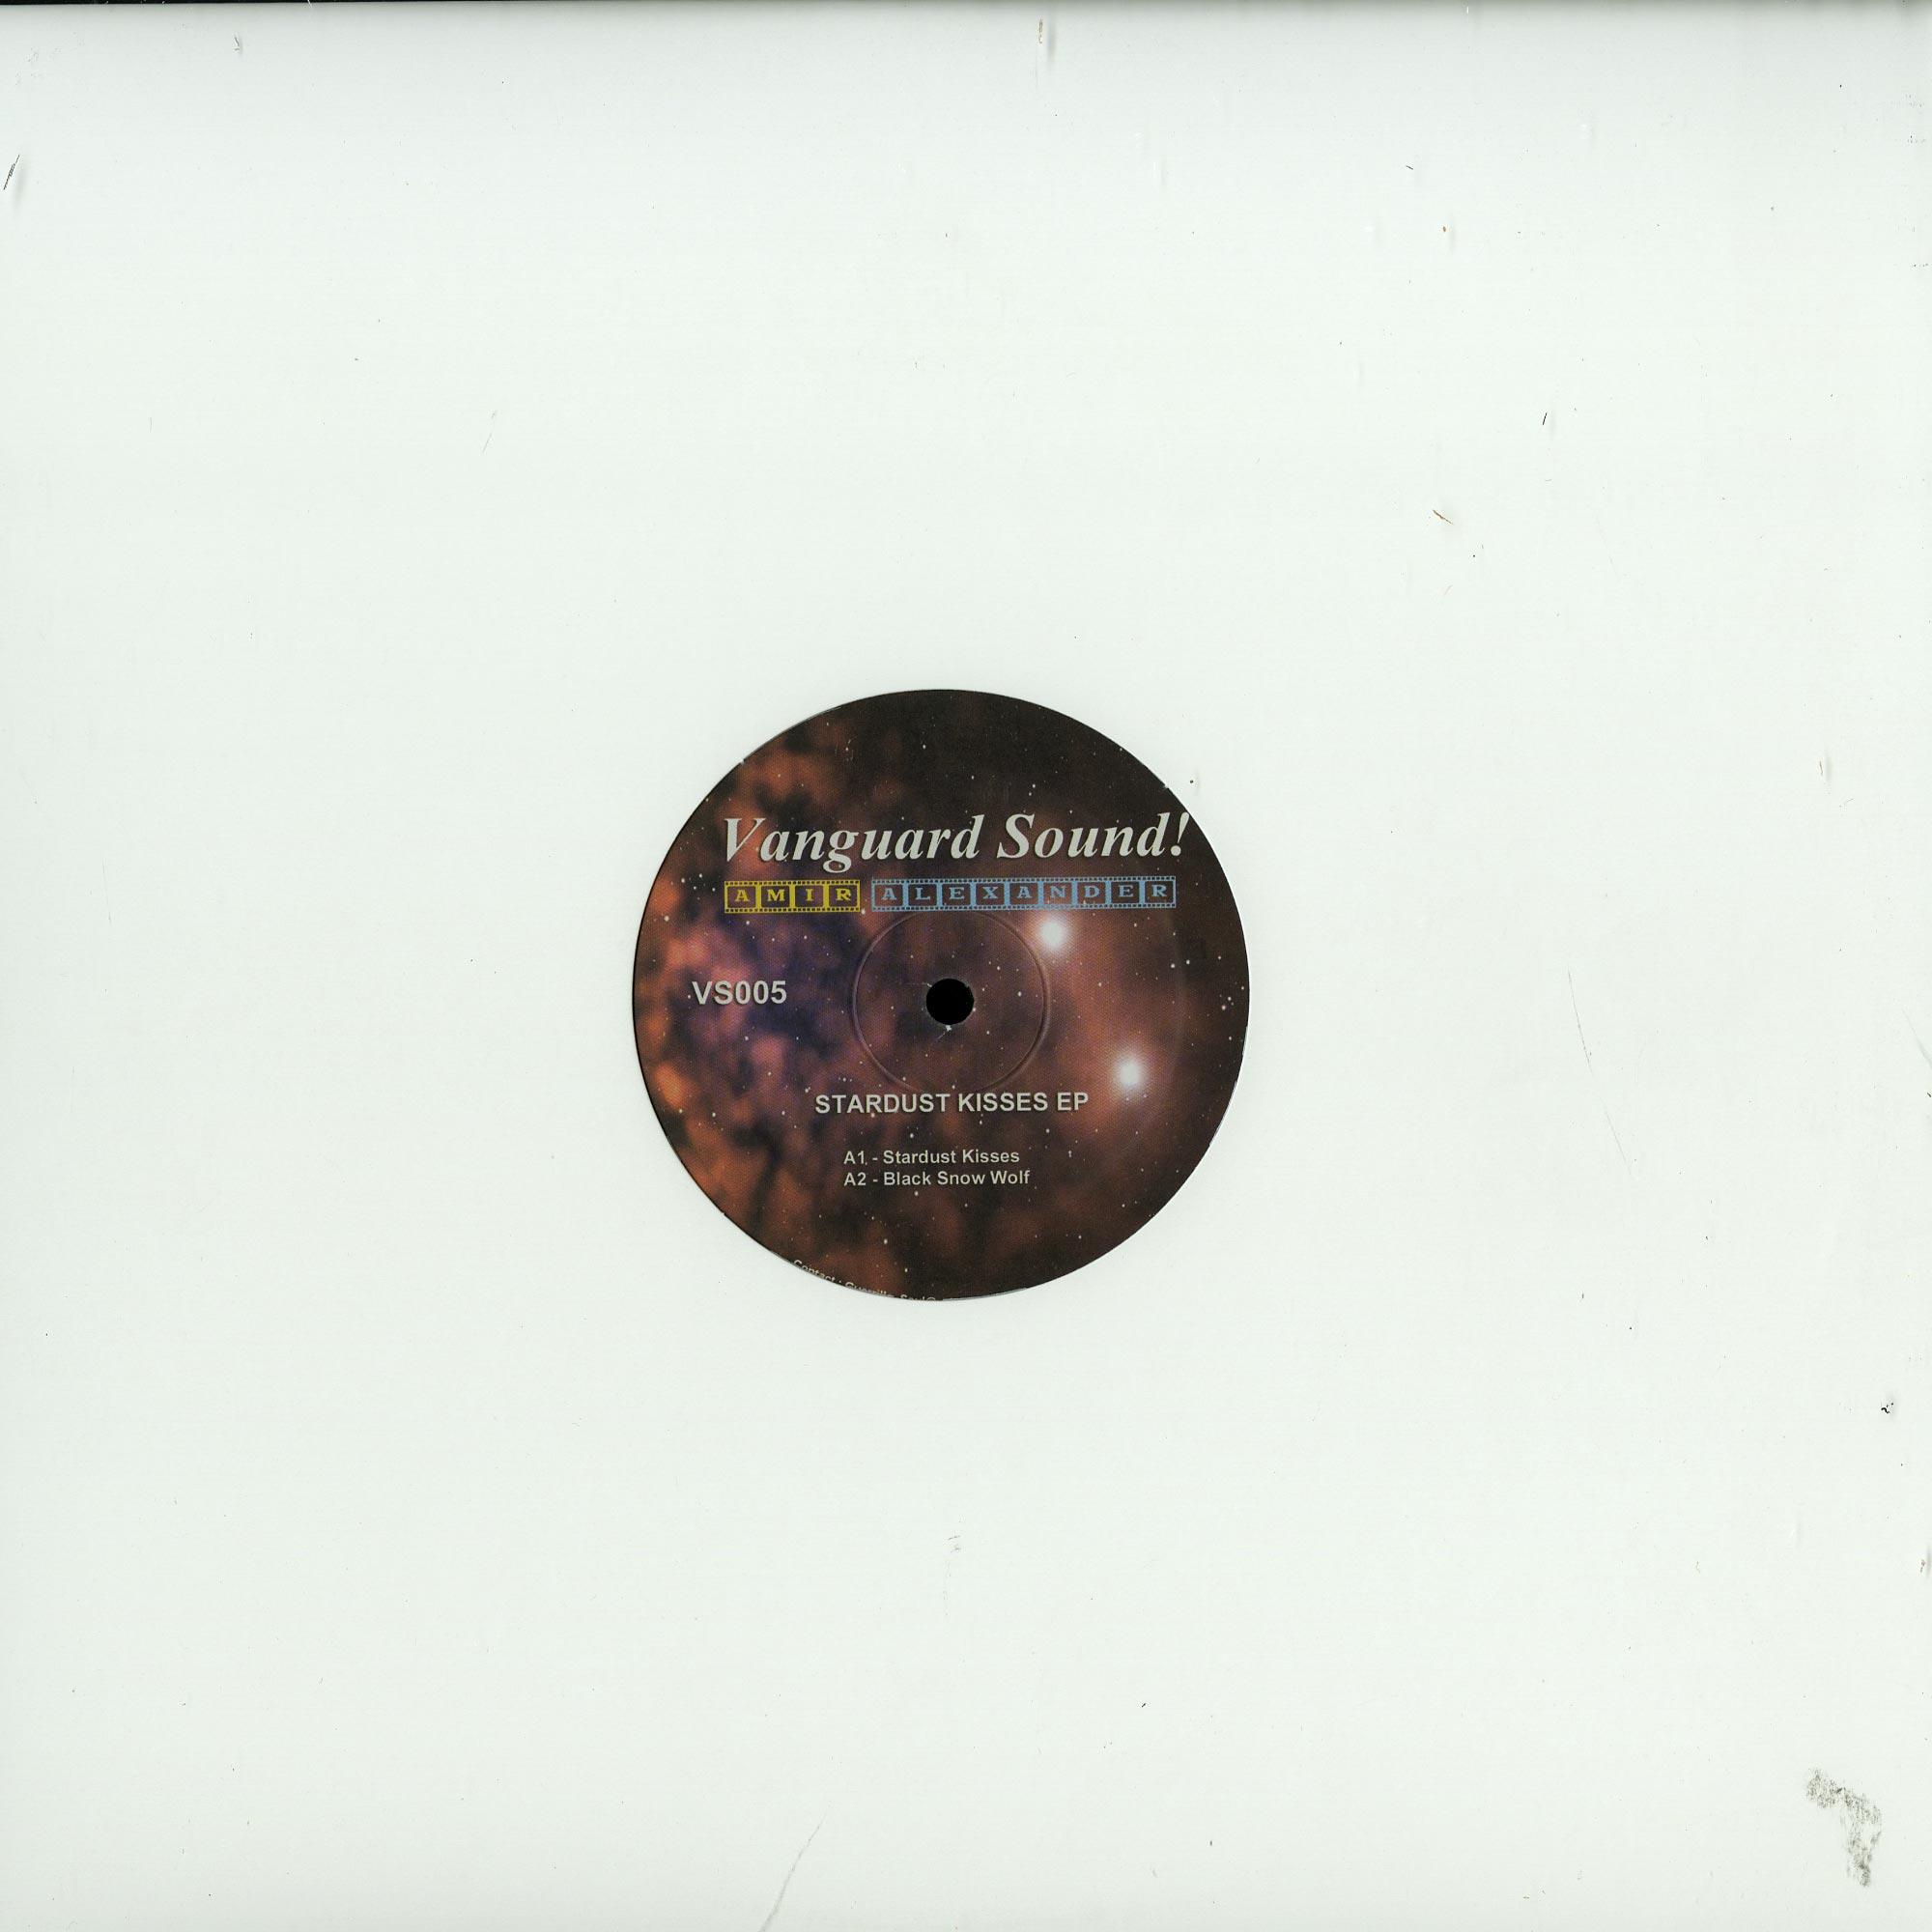 Amir Alexander - STARDUST KISSES EP